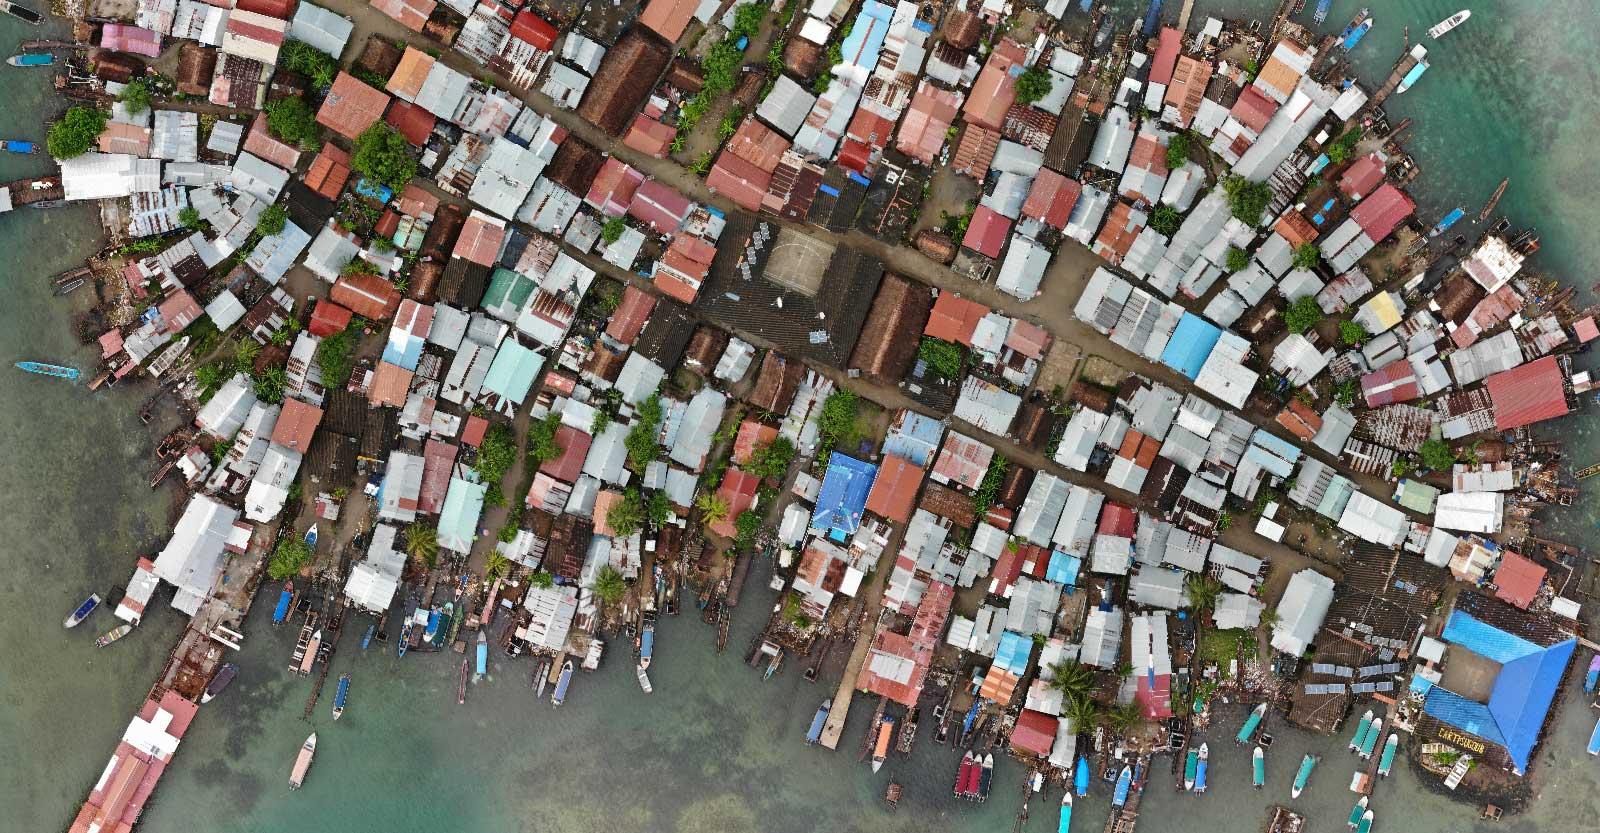 Overpopulated indigenous island